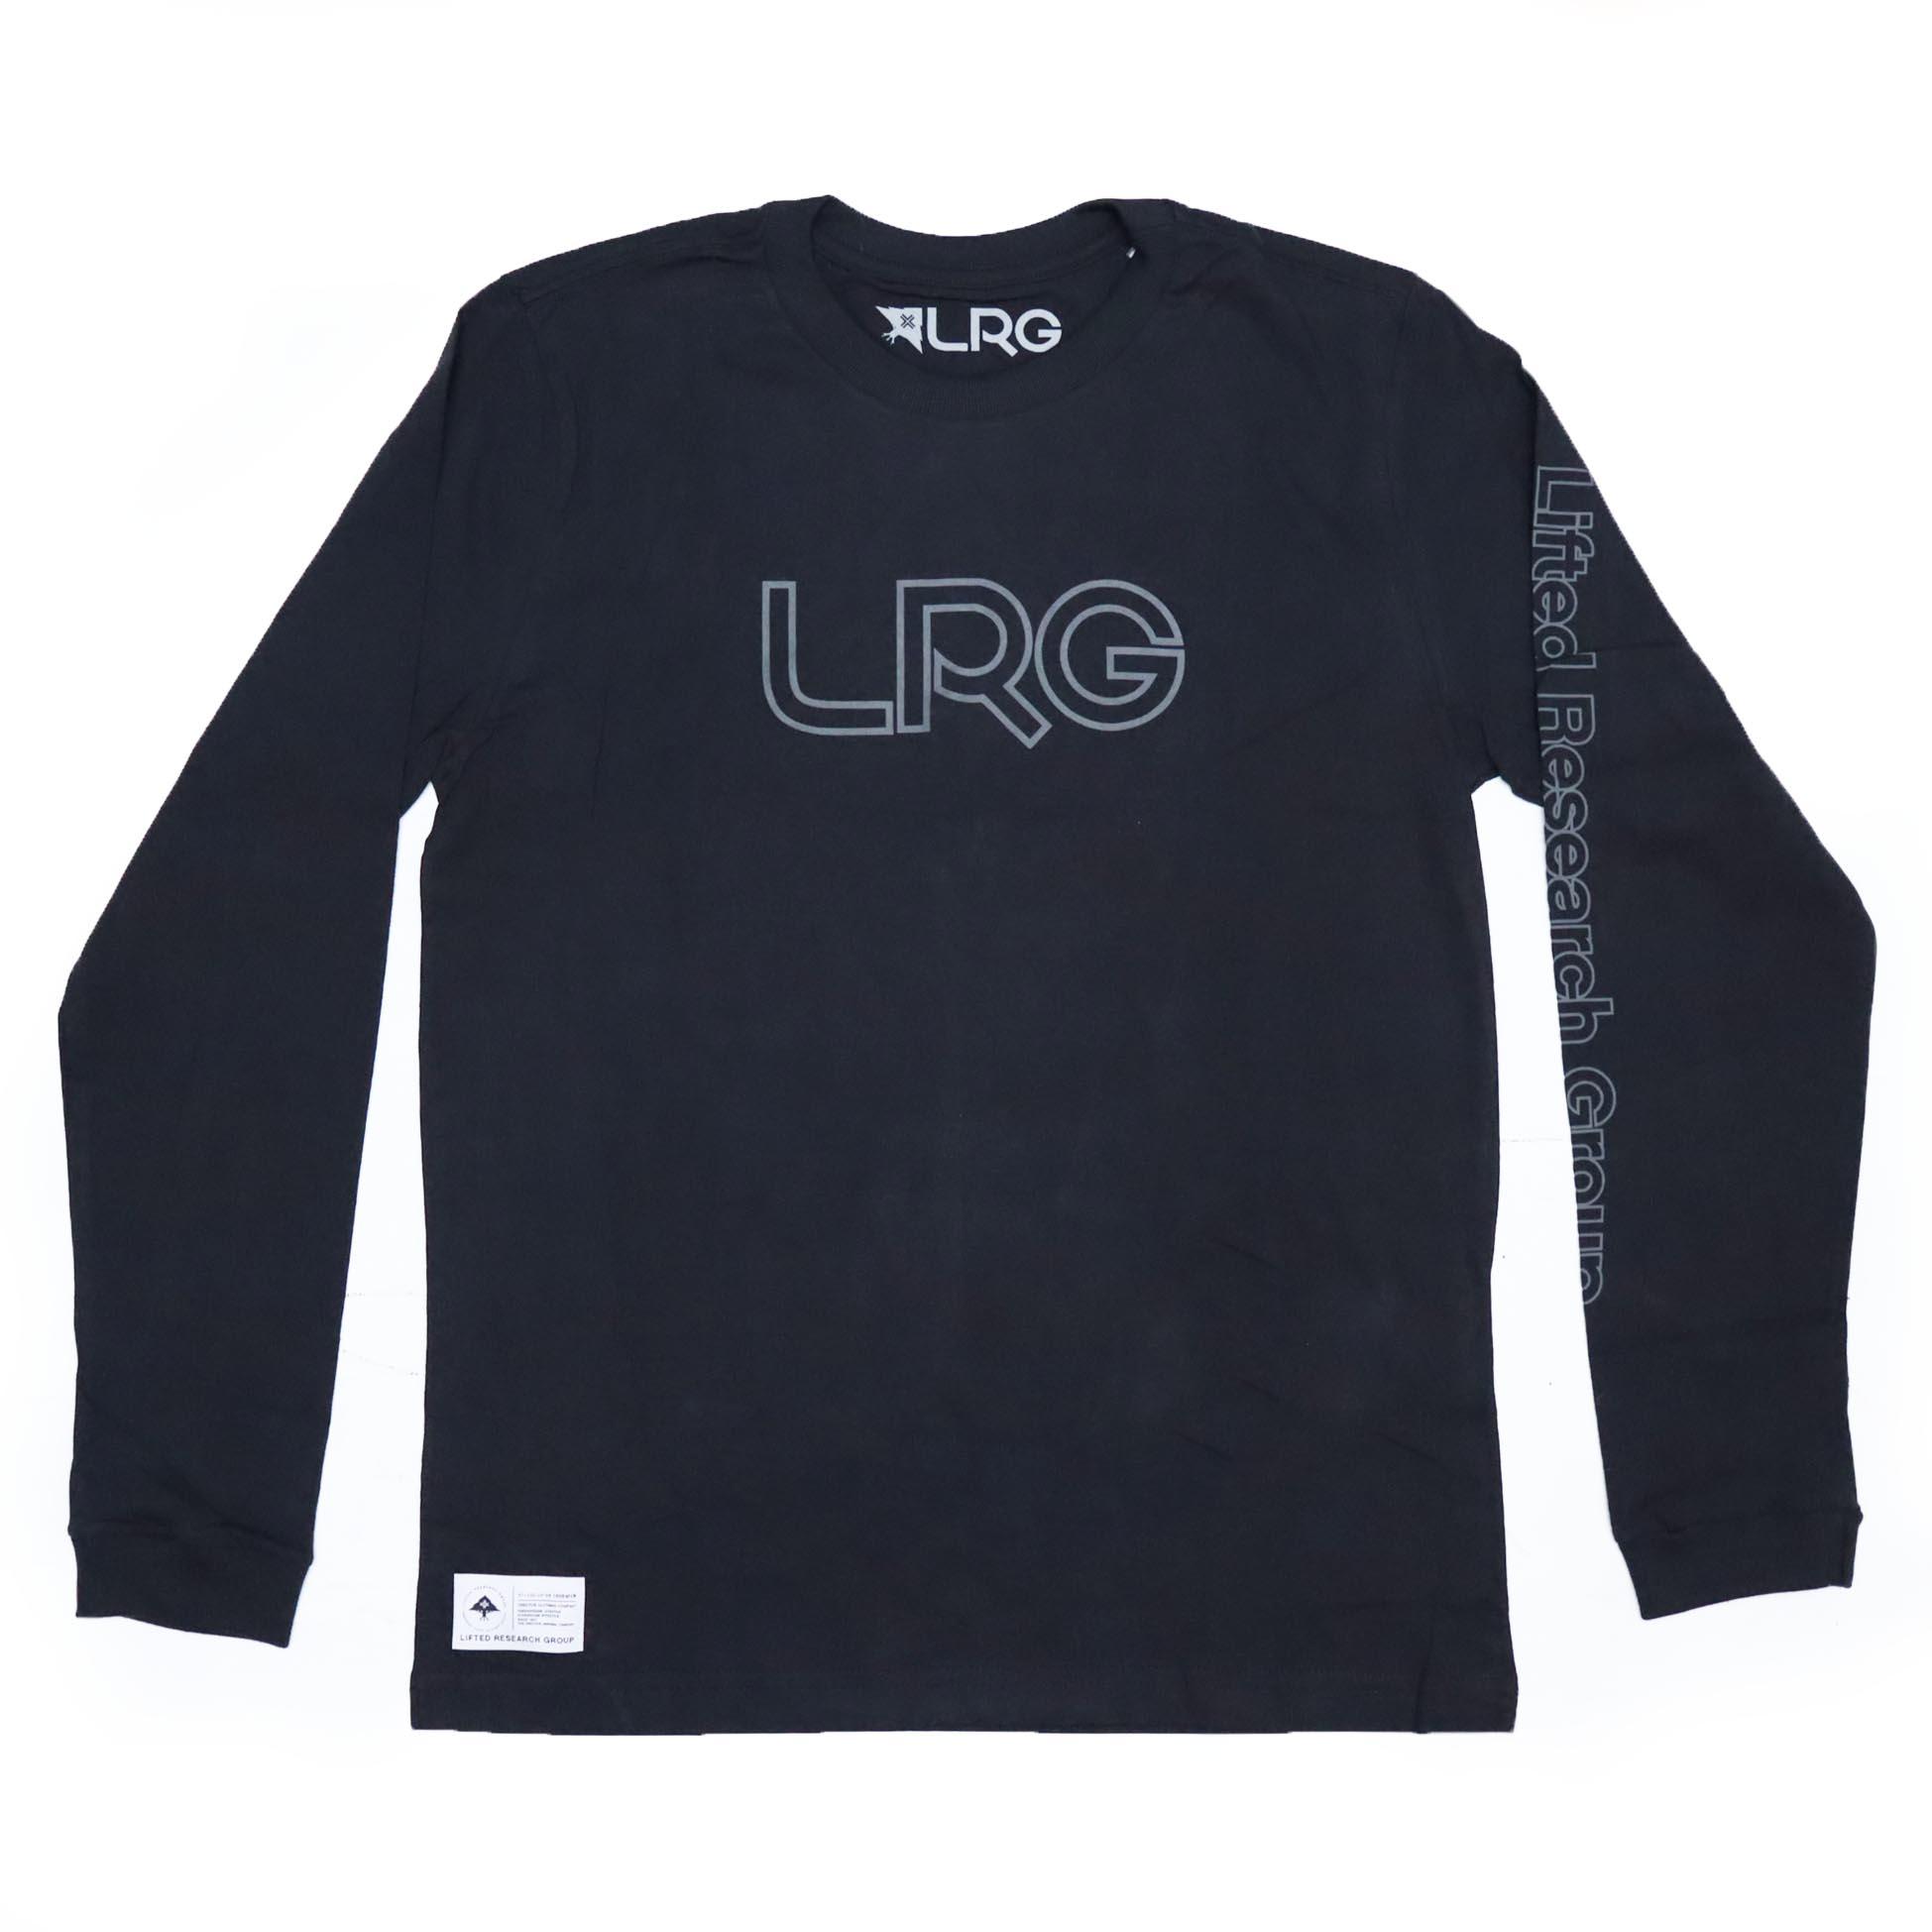 Camiseta Manga Longa LRG Brisson - Preto